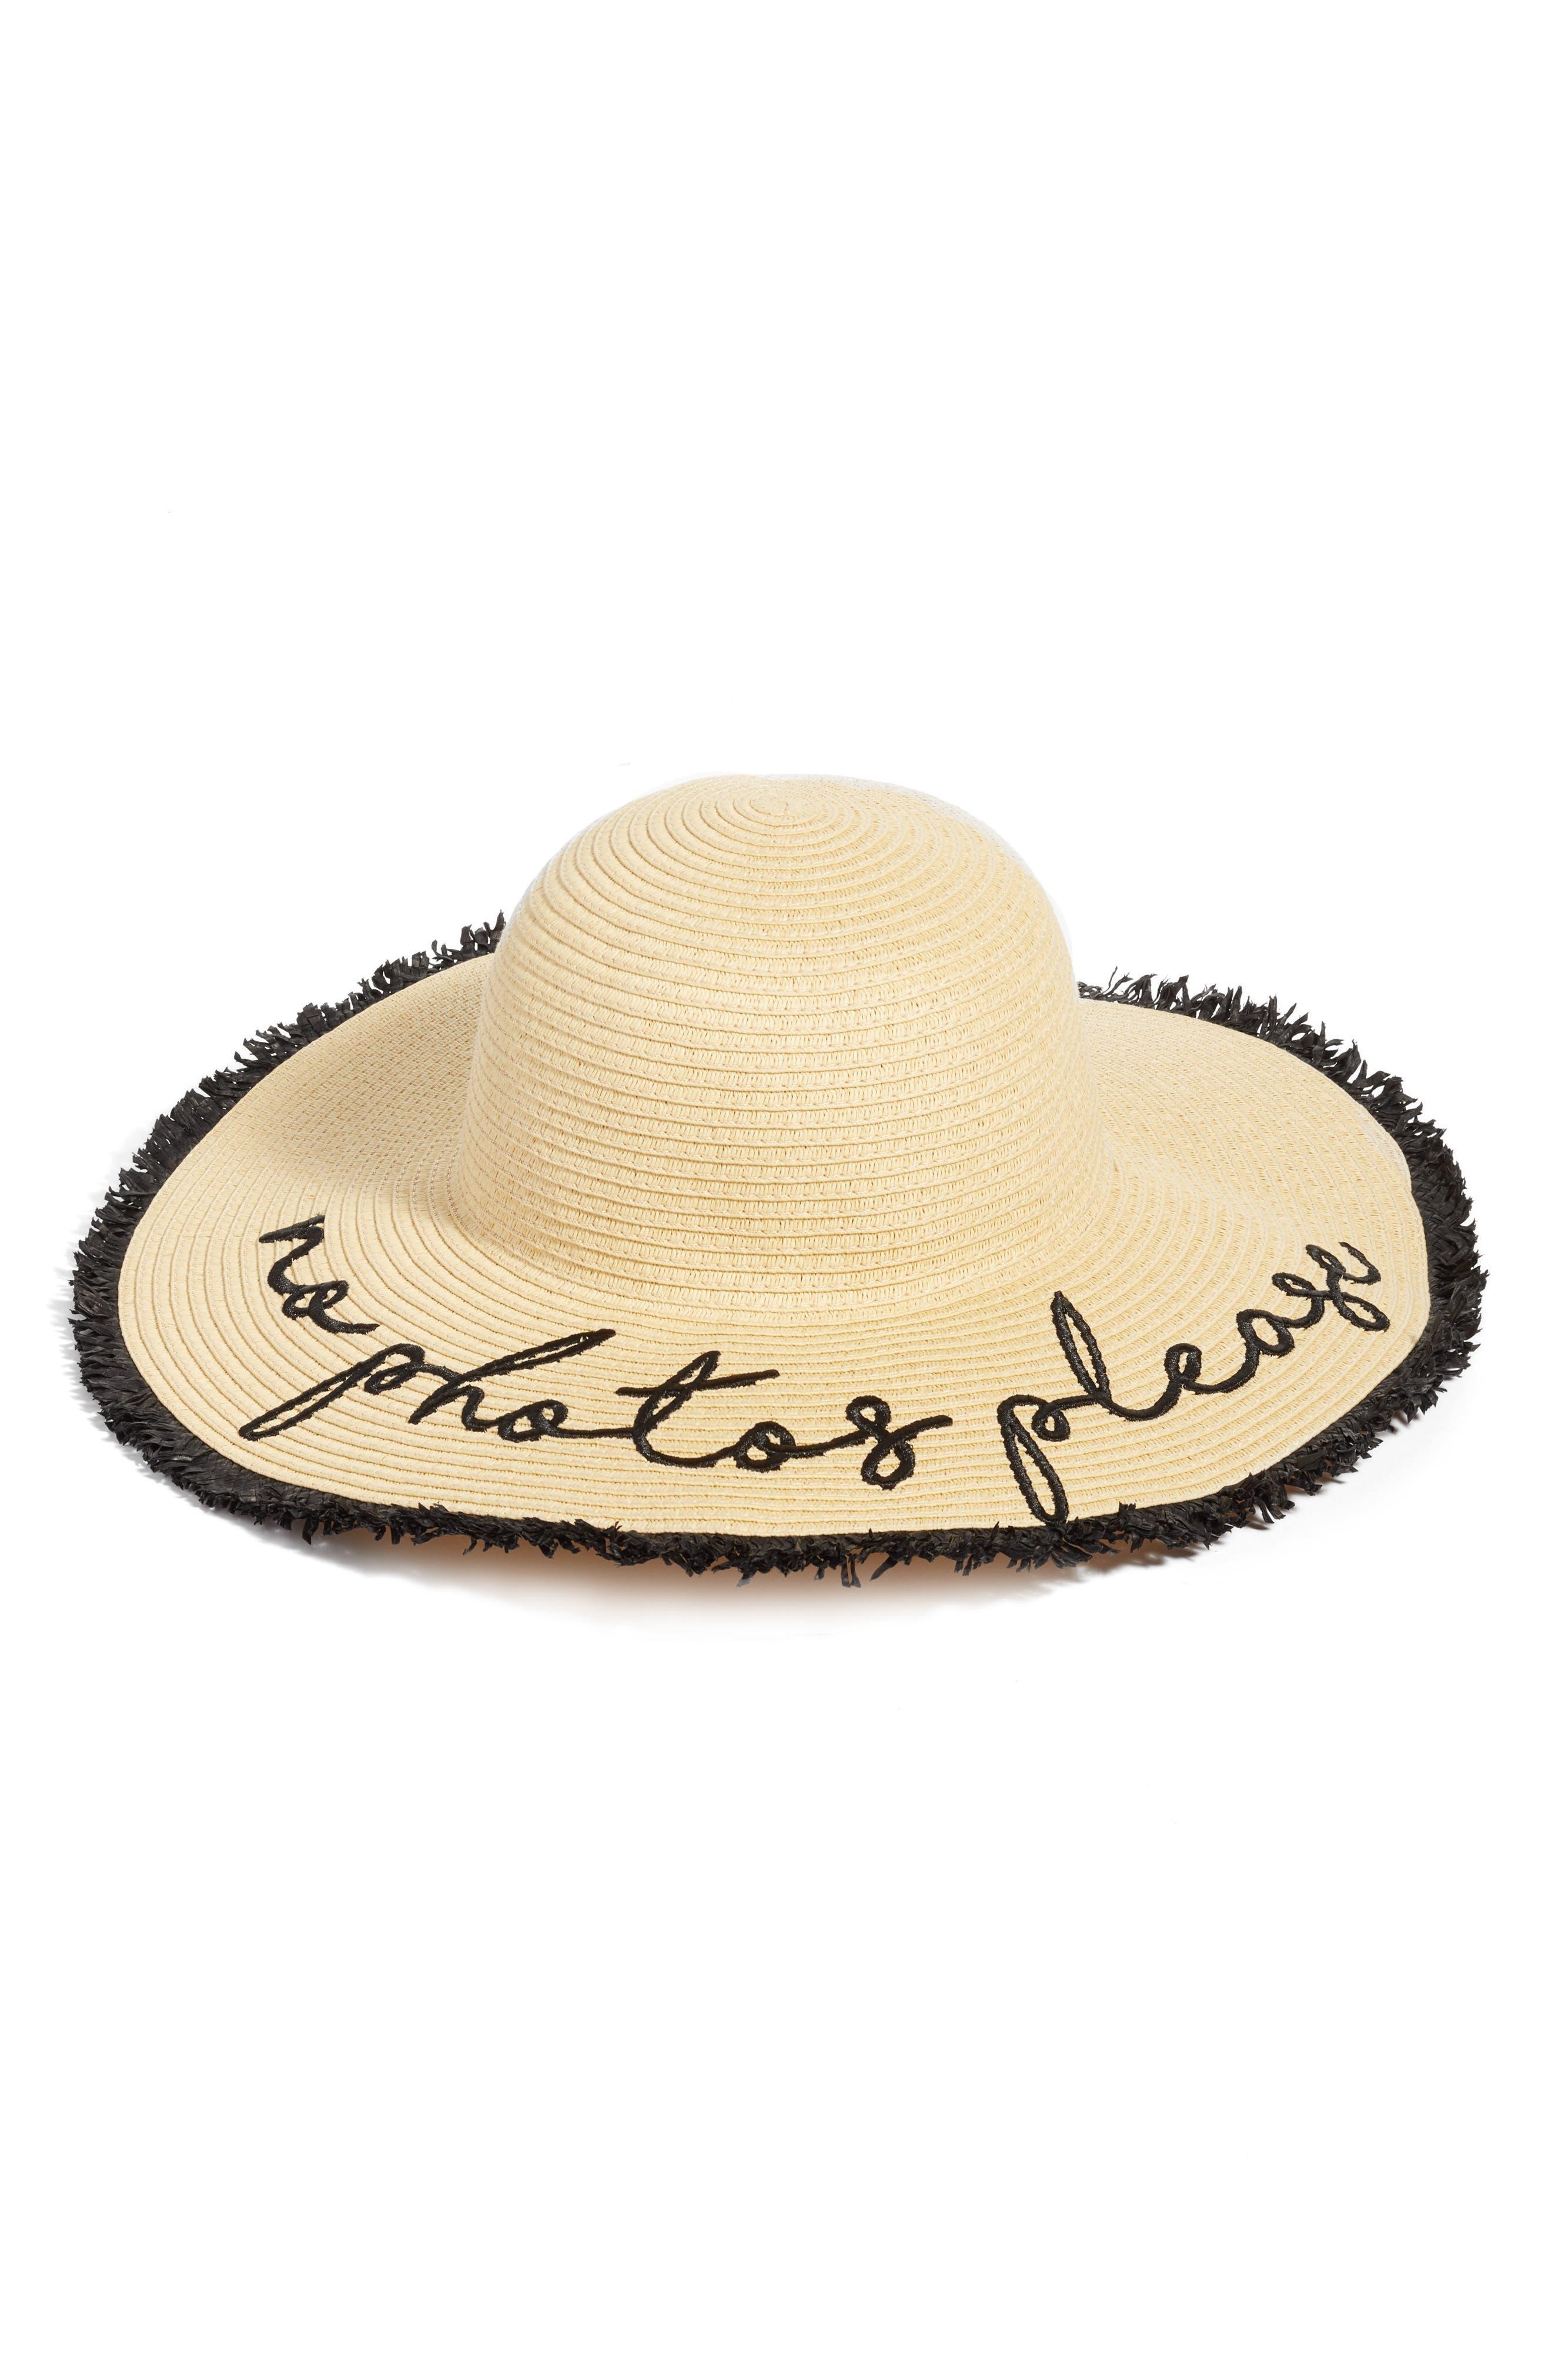 No Photos Please Floppy Straw Hat,                         Main,                         color, 250